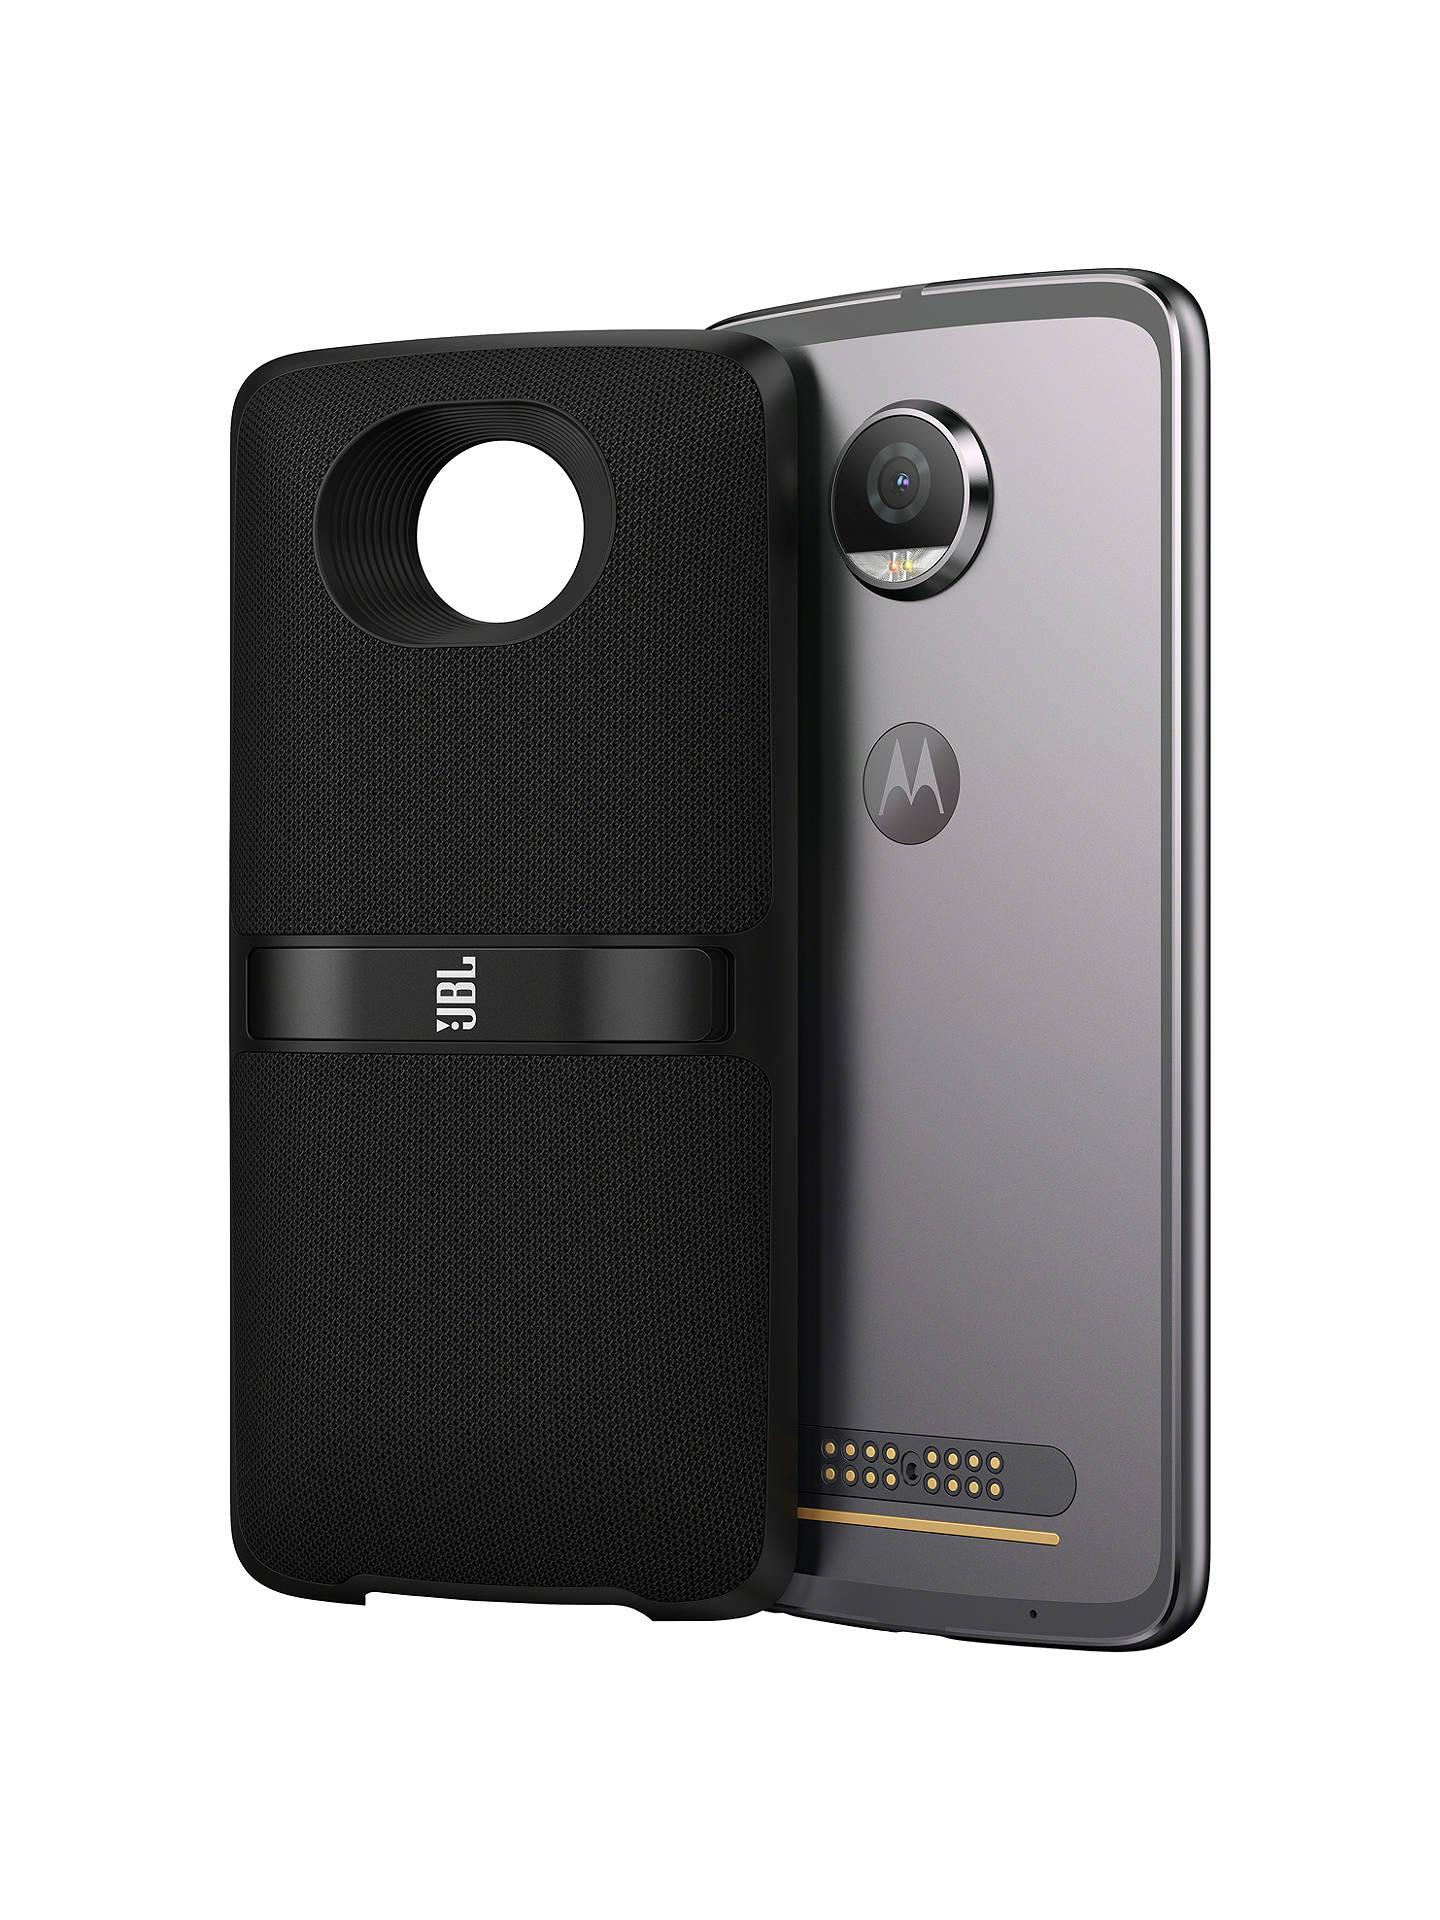 BuyMoto Mod JBL SoundBoost 2 Speaker for Any Smartphone in Moto Z Family Online at johnlewis ...